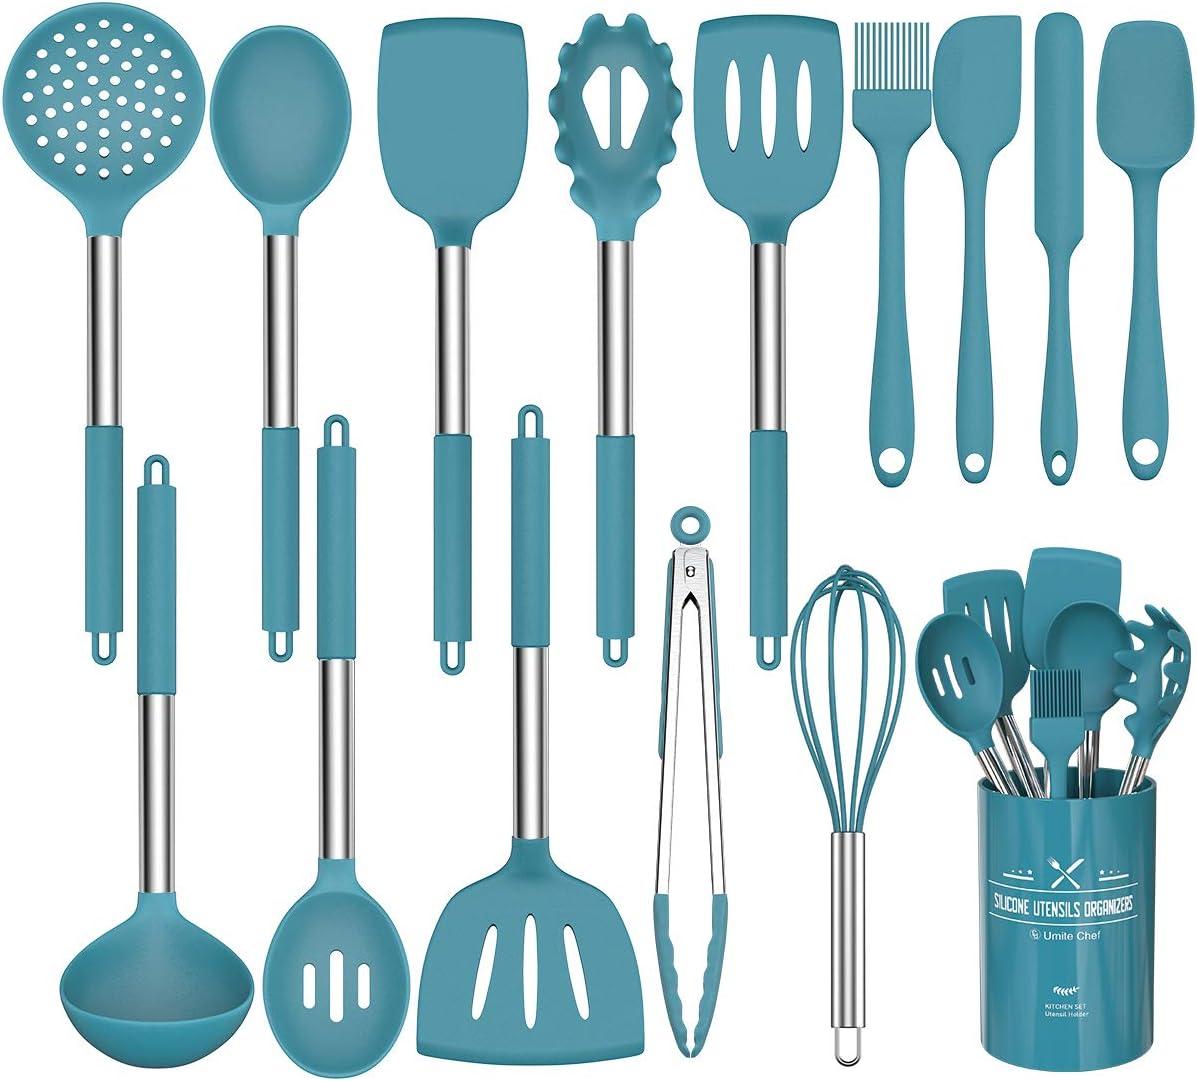 15 Pcs Silicone Cooking Utensils Kitchen Portland Mall - Che Max 43% OFF Umite Utensil Set